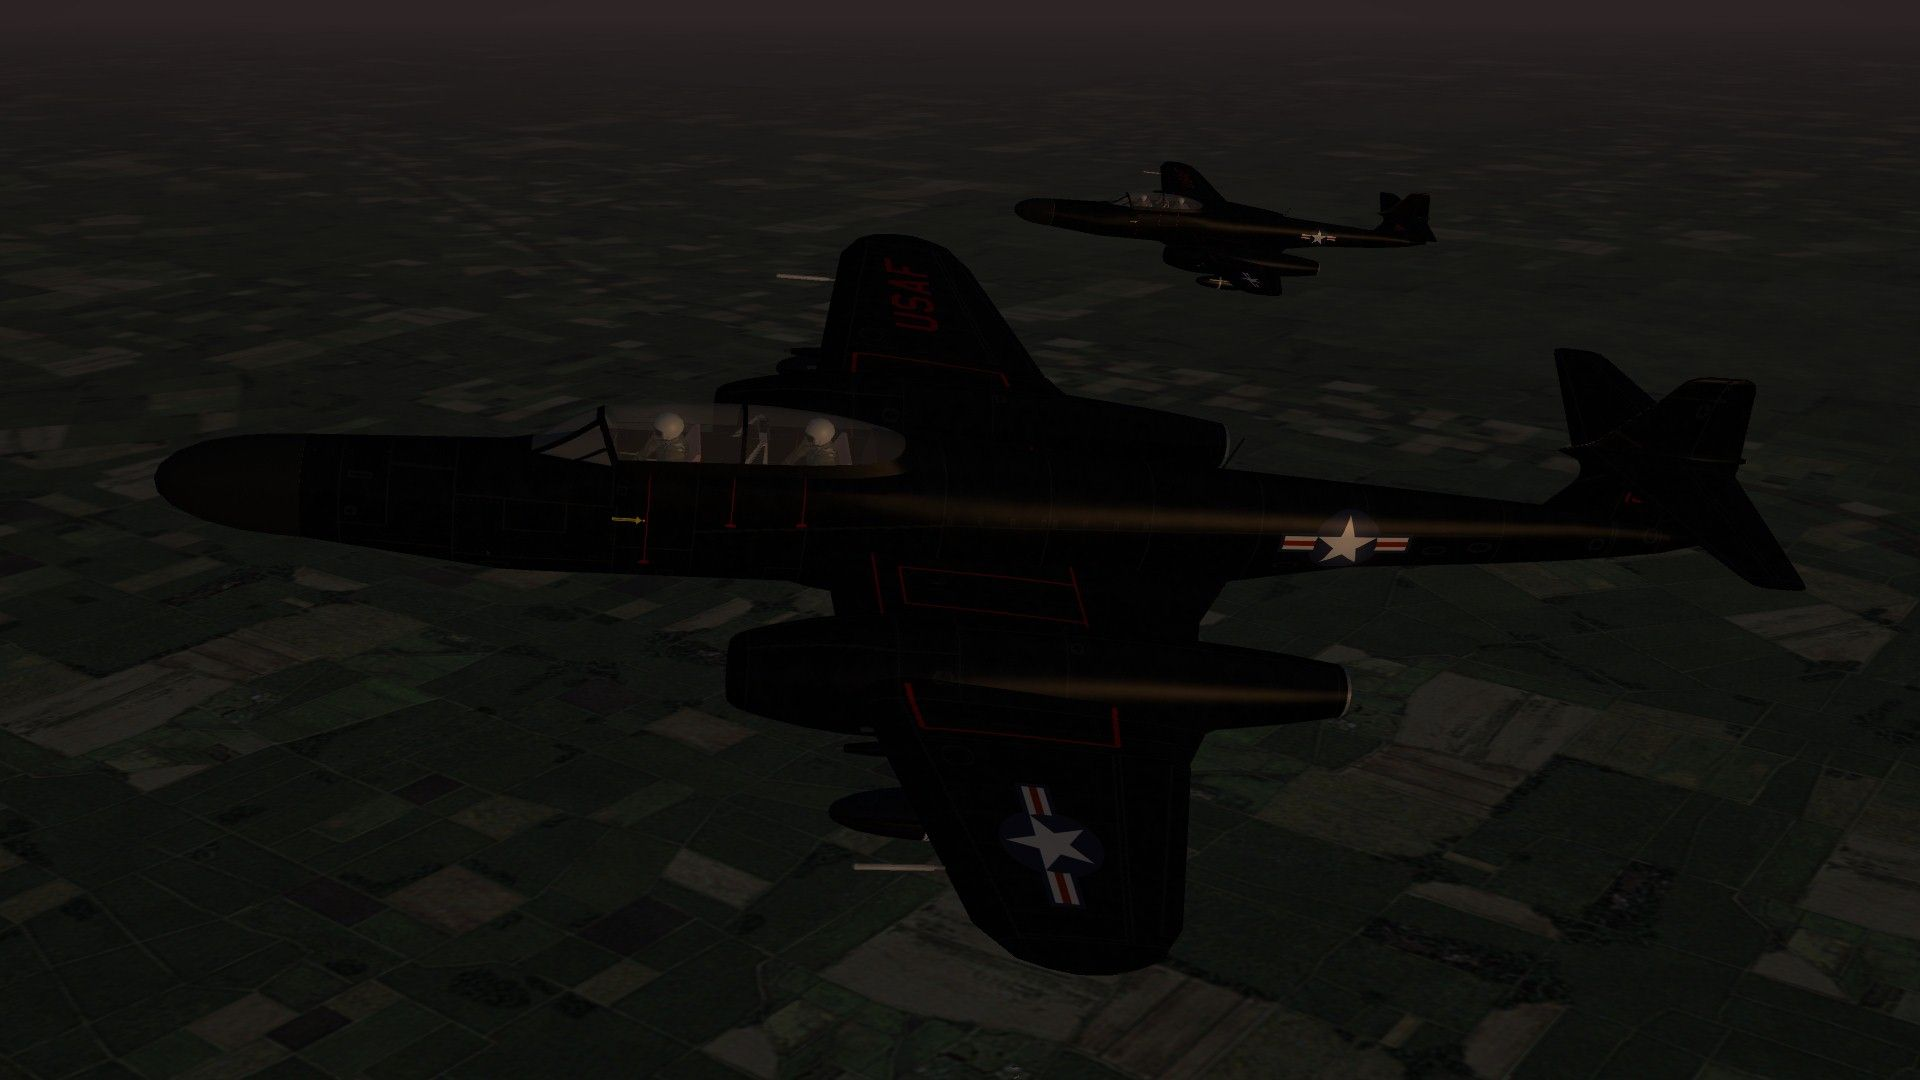 USAFF-73NMETEOR01.jpg